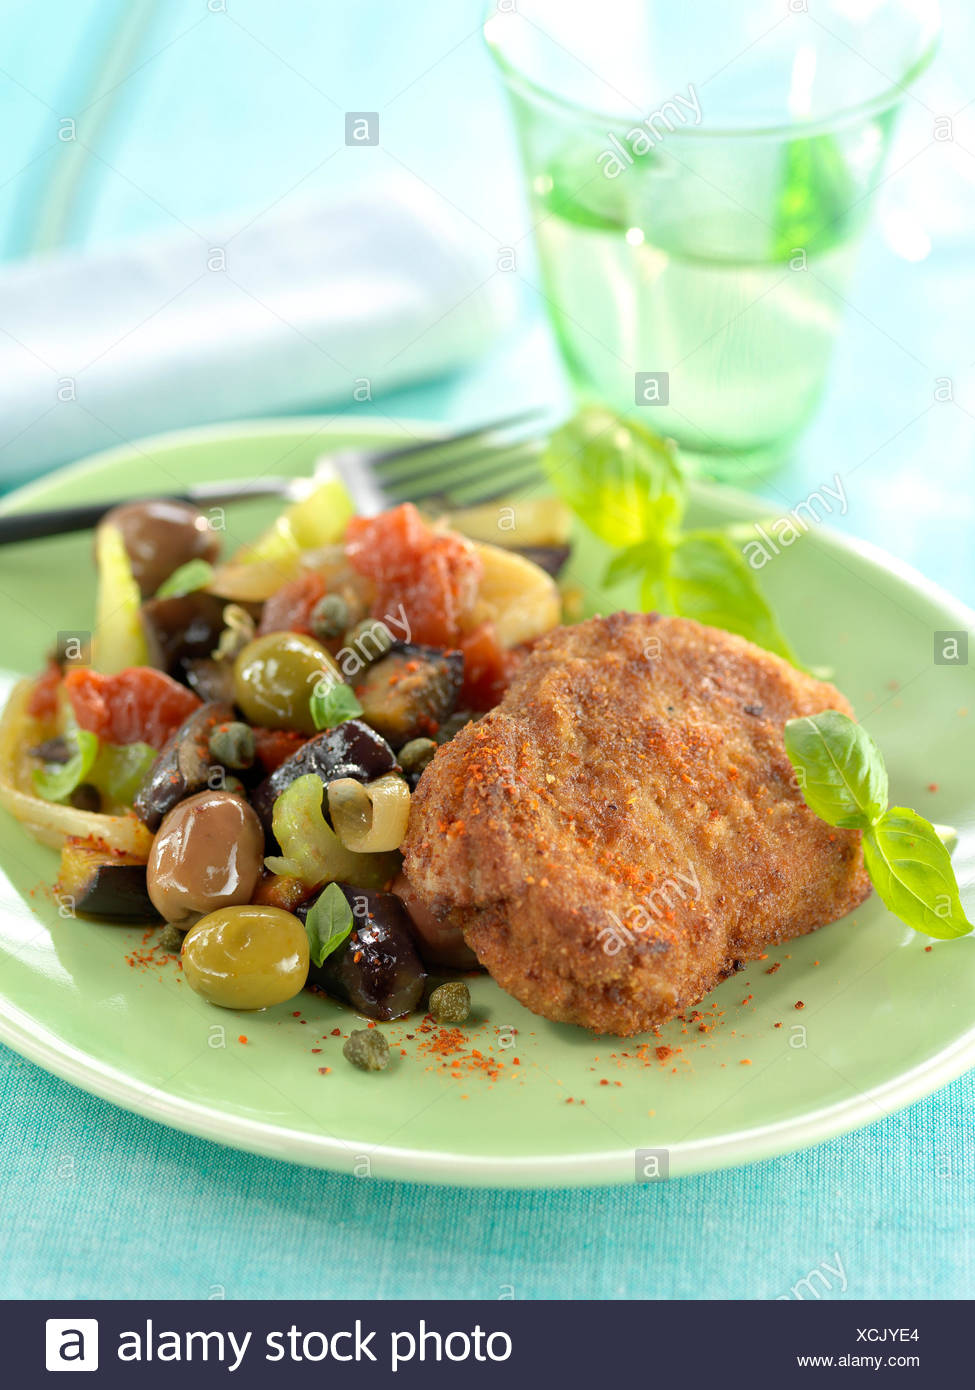 Crisp grenadine of veal with caponata - Stock Image